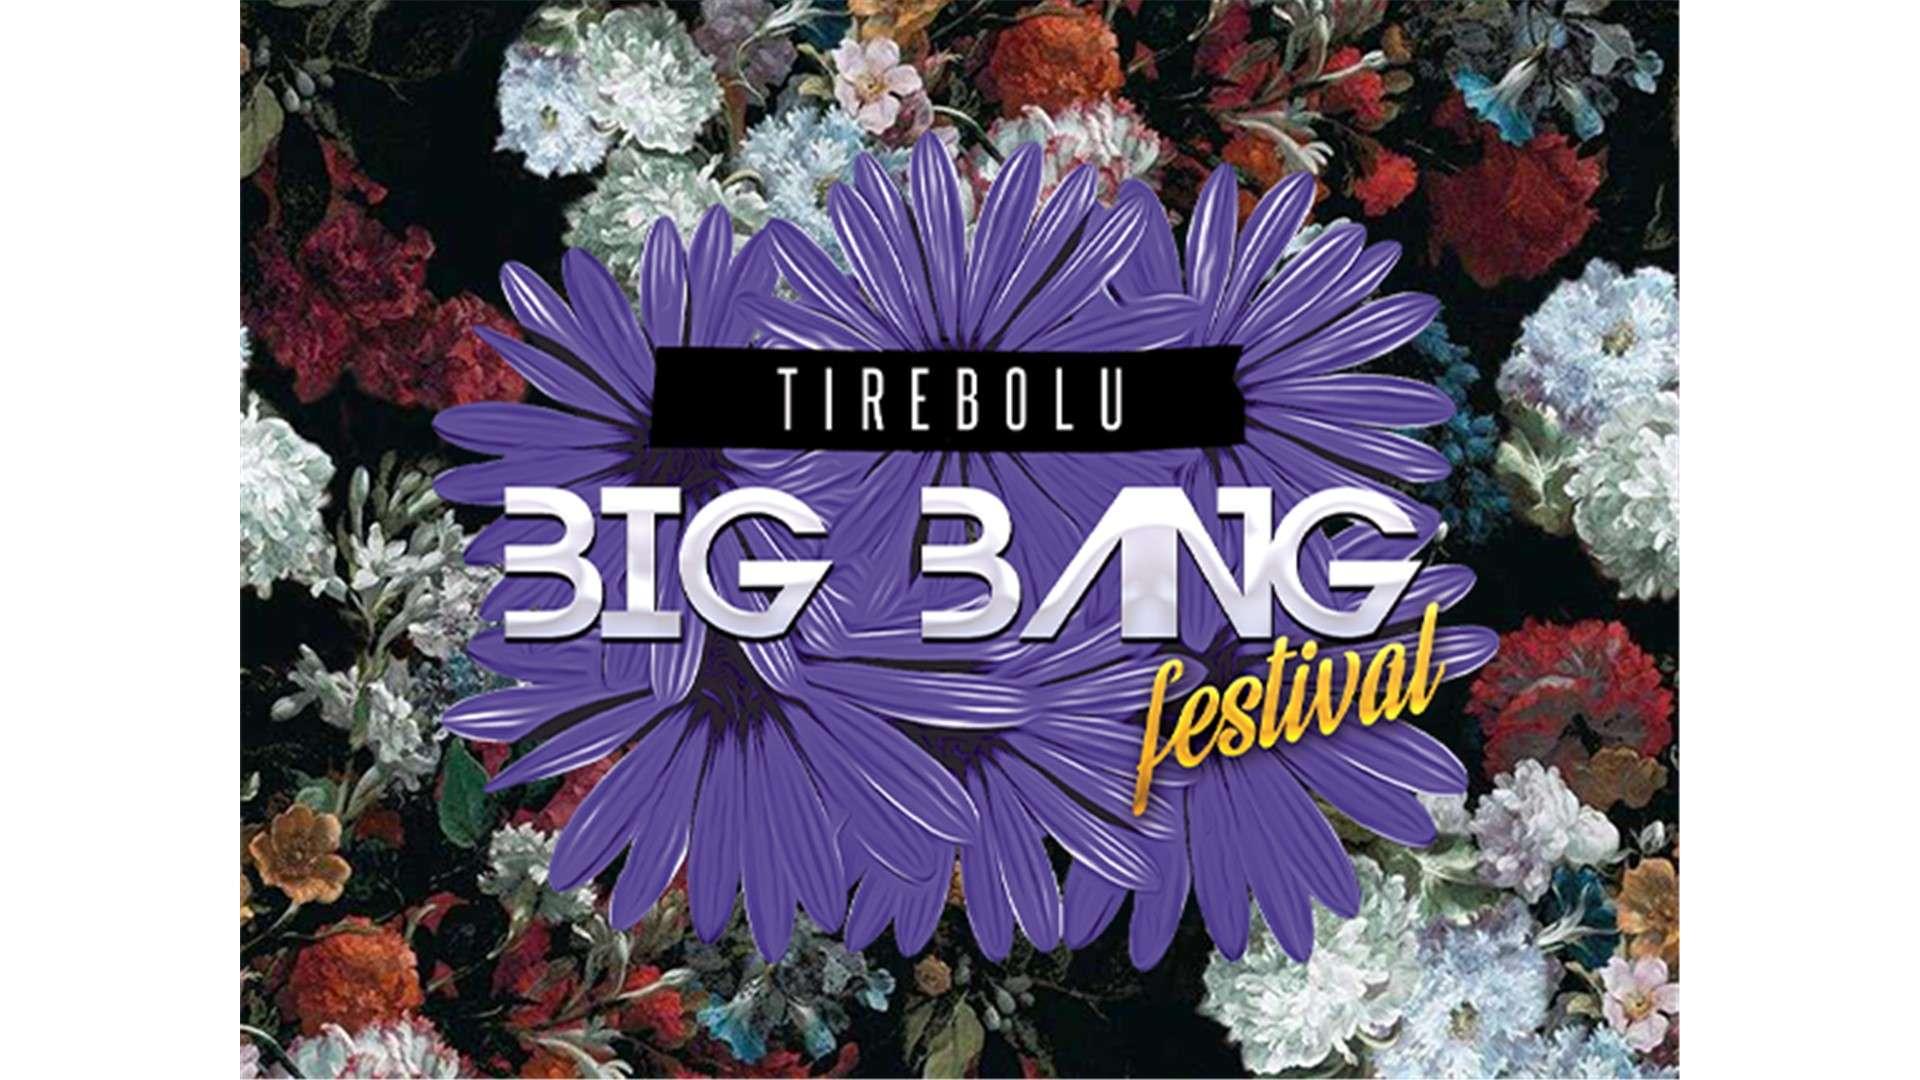 big-bang-festival-tirebolu-1230